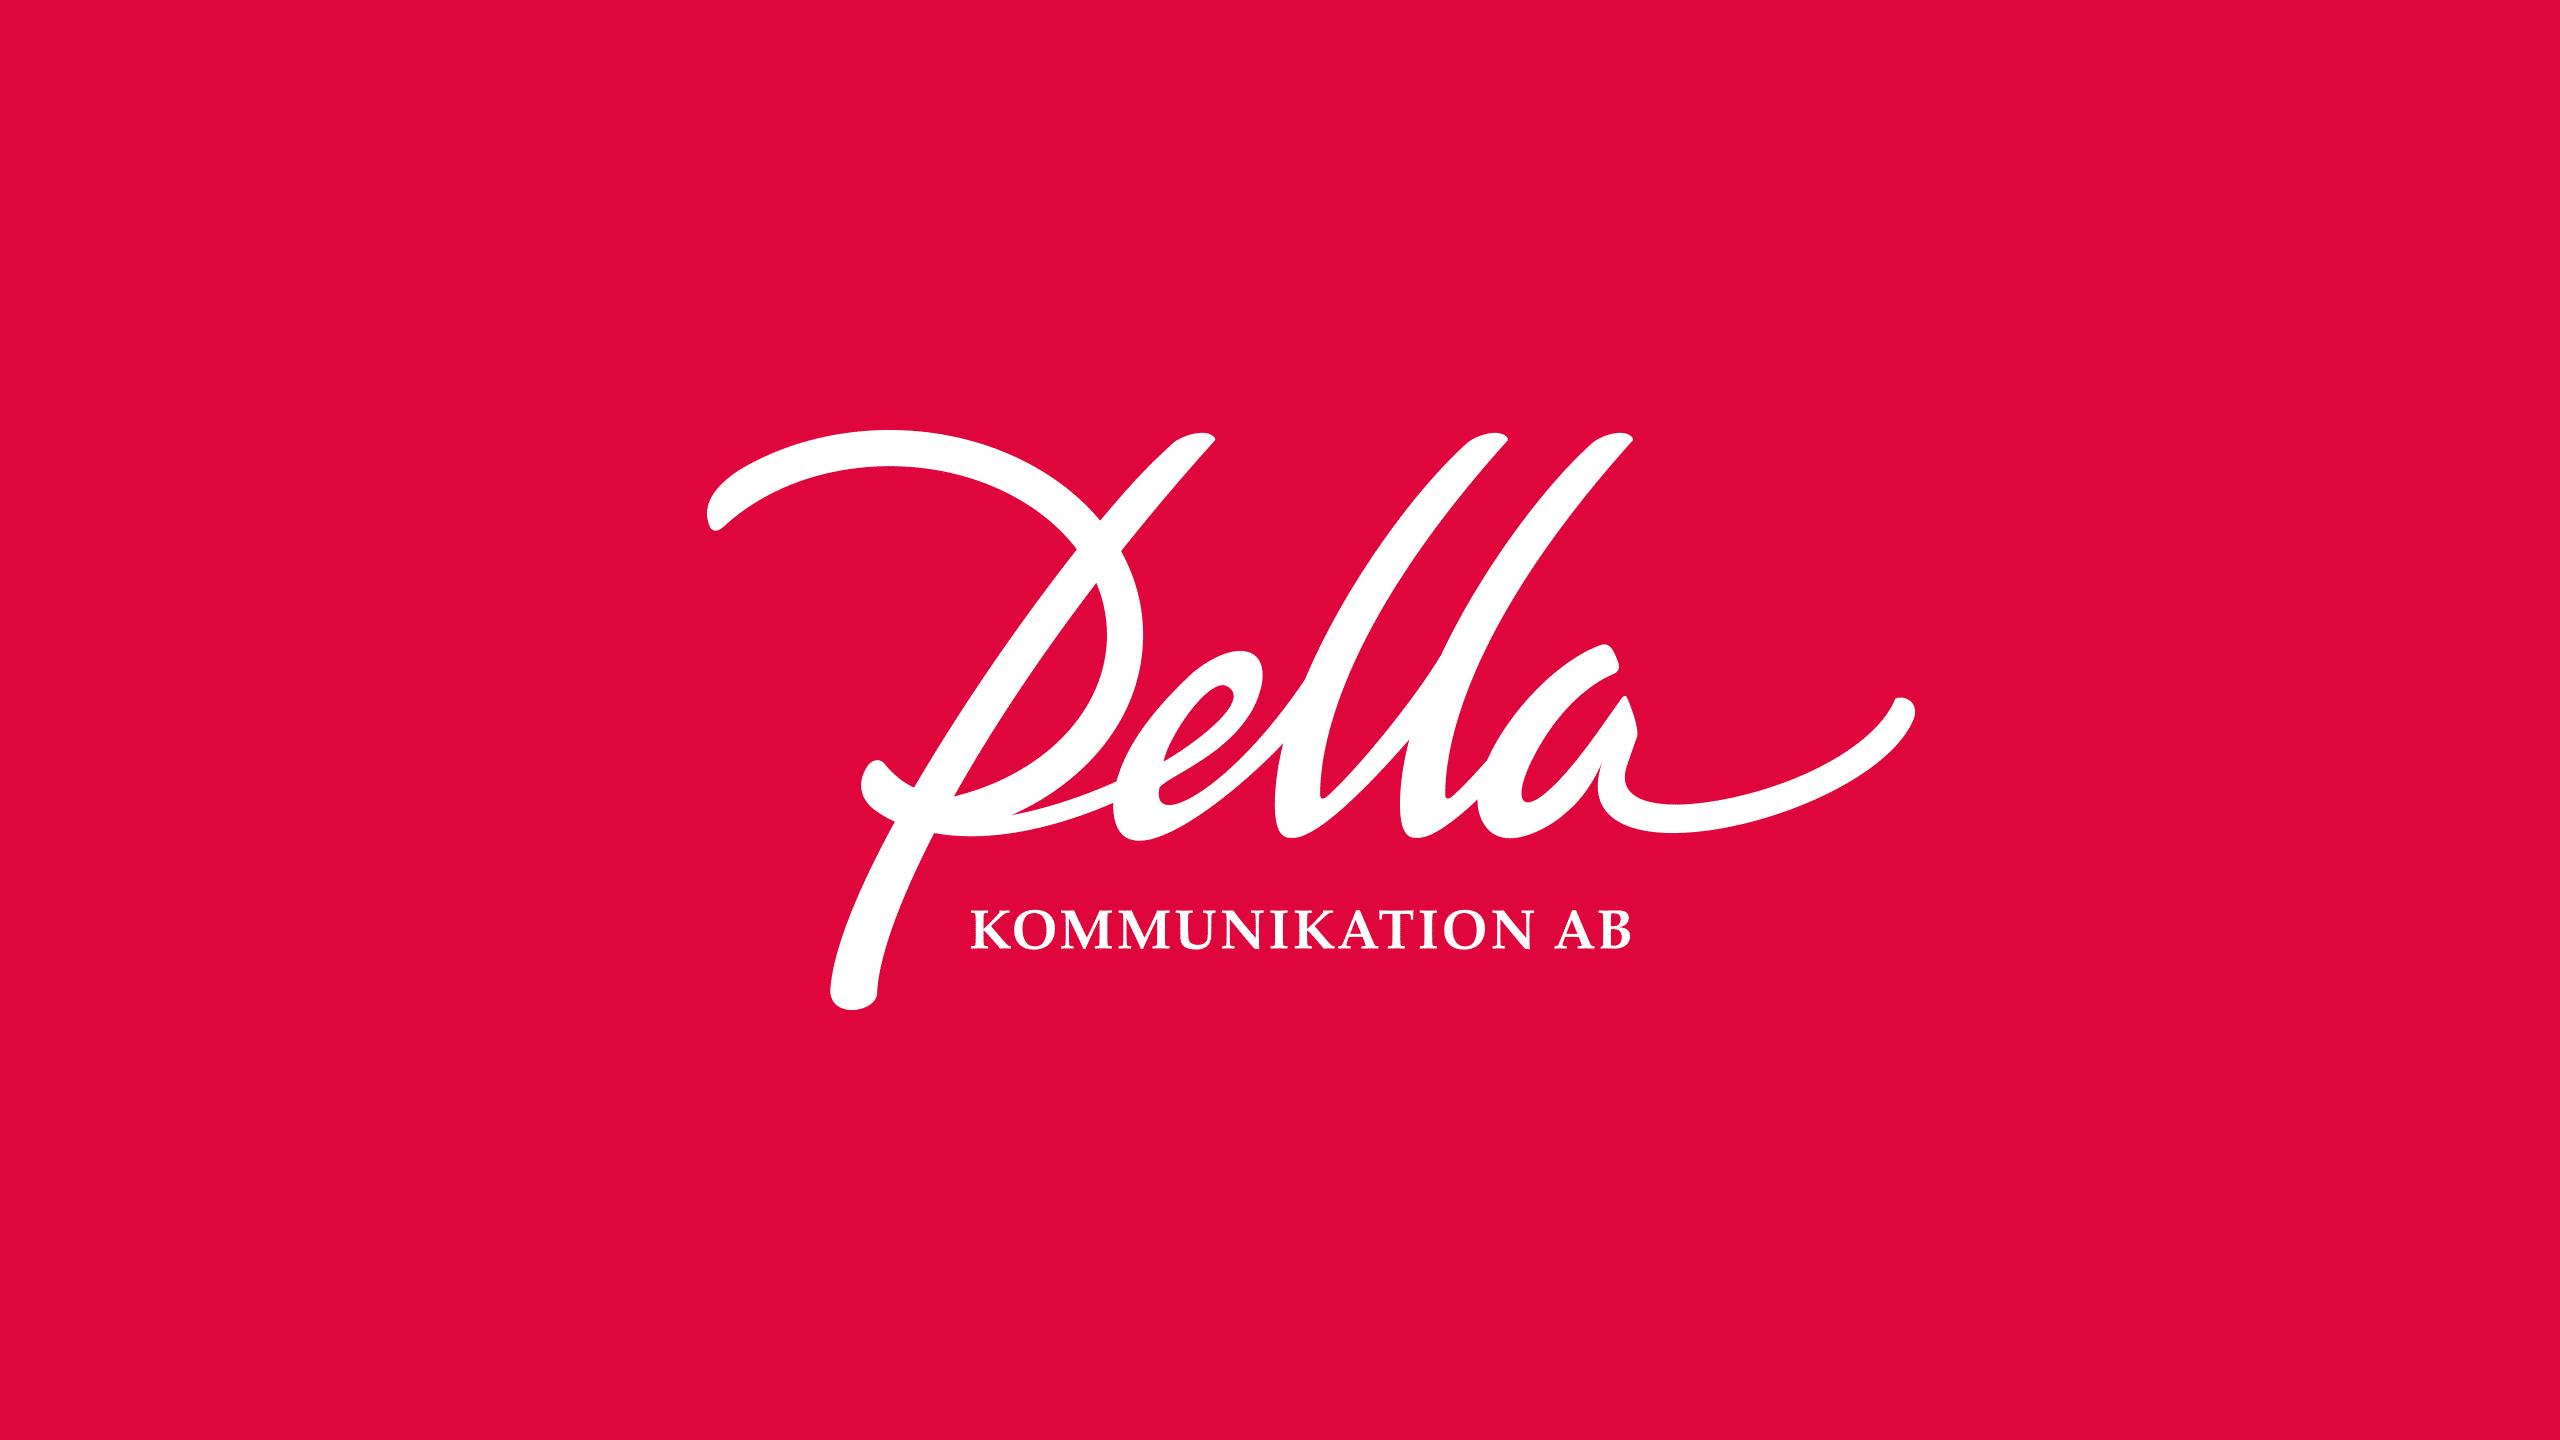 Final logo for Pella Kommunikation